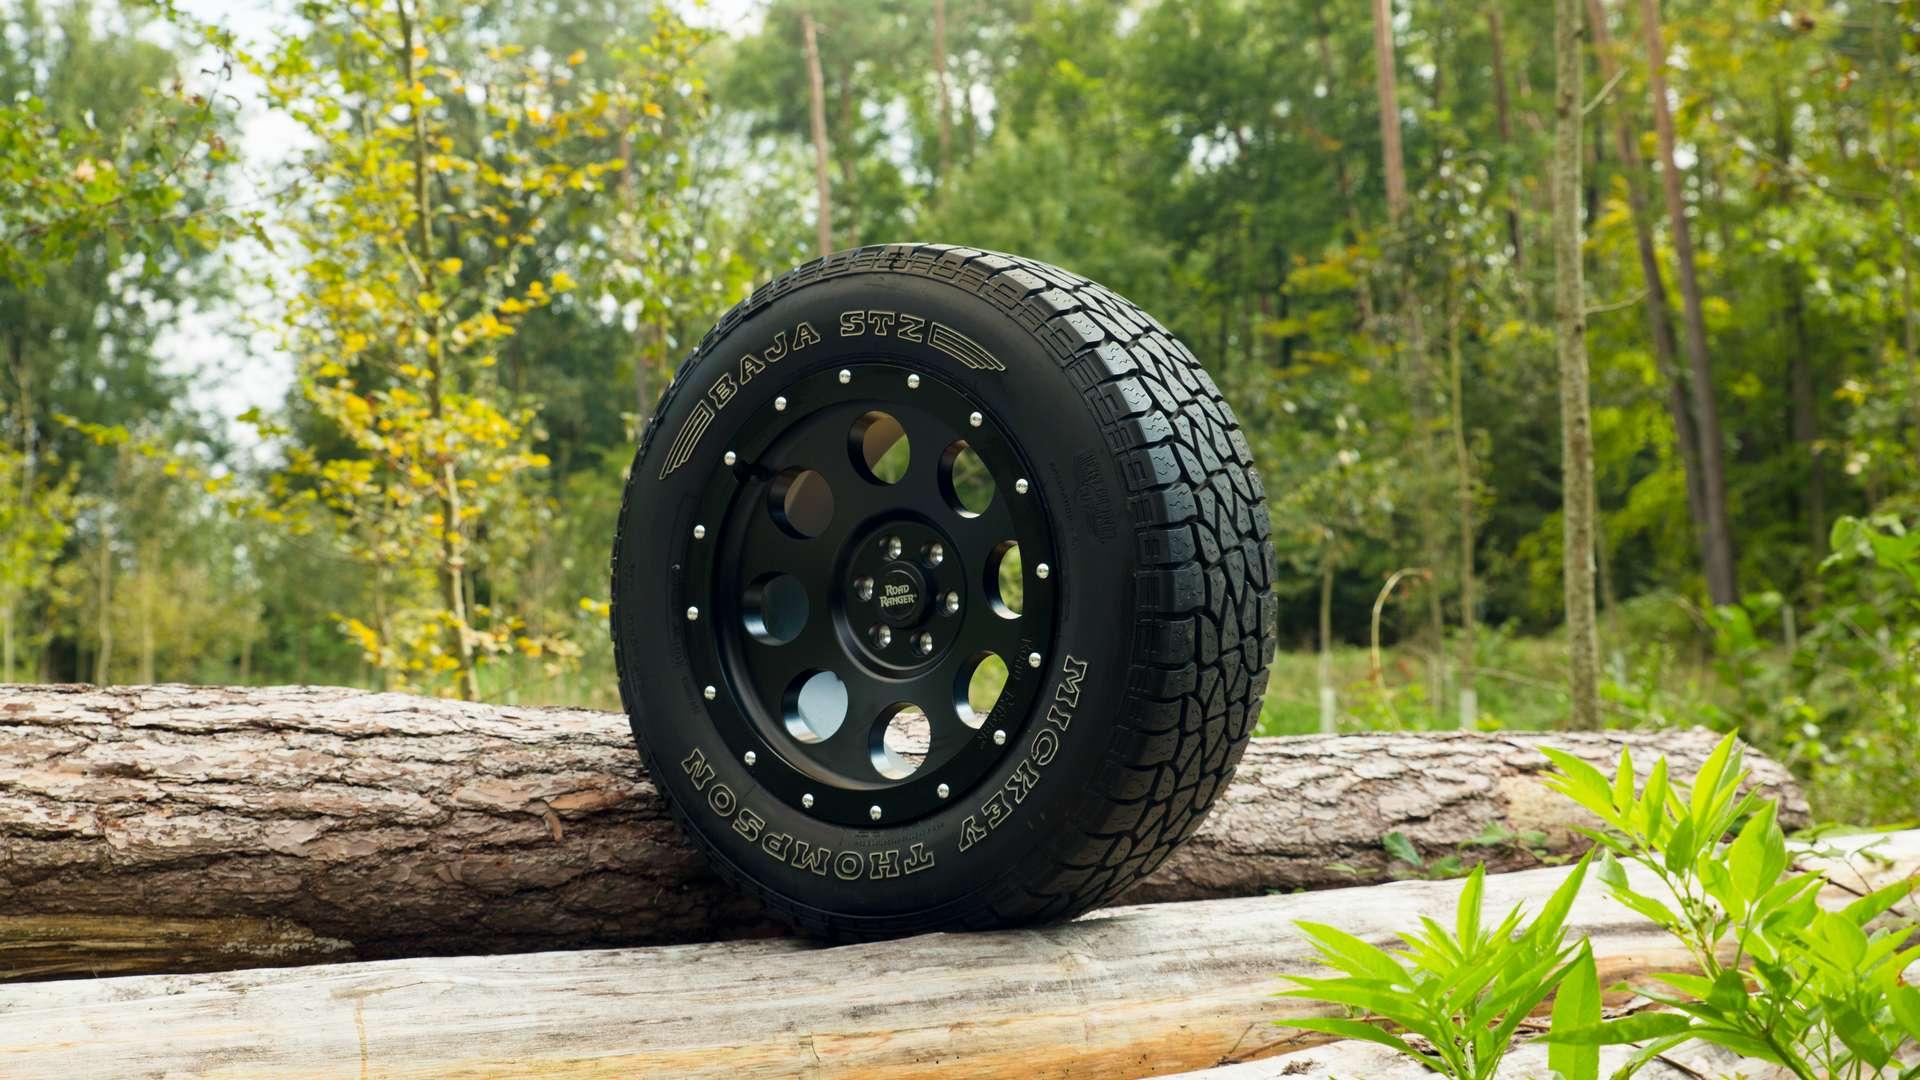 Felge / Komplettrad Felgen und Reifen